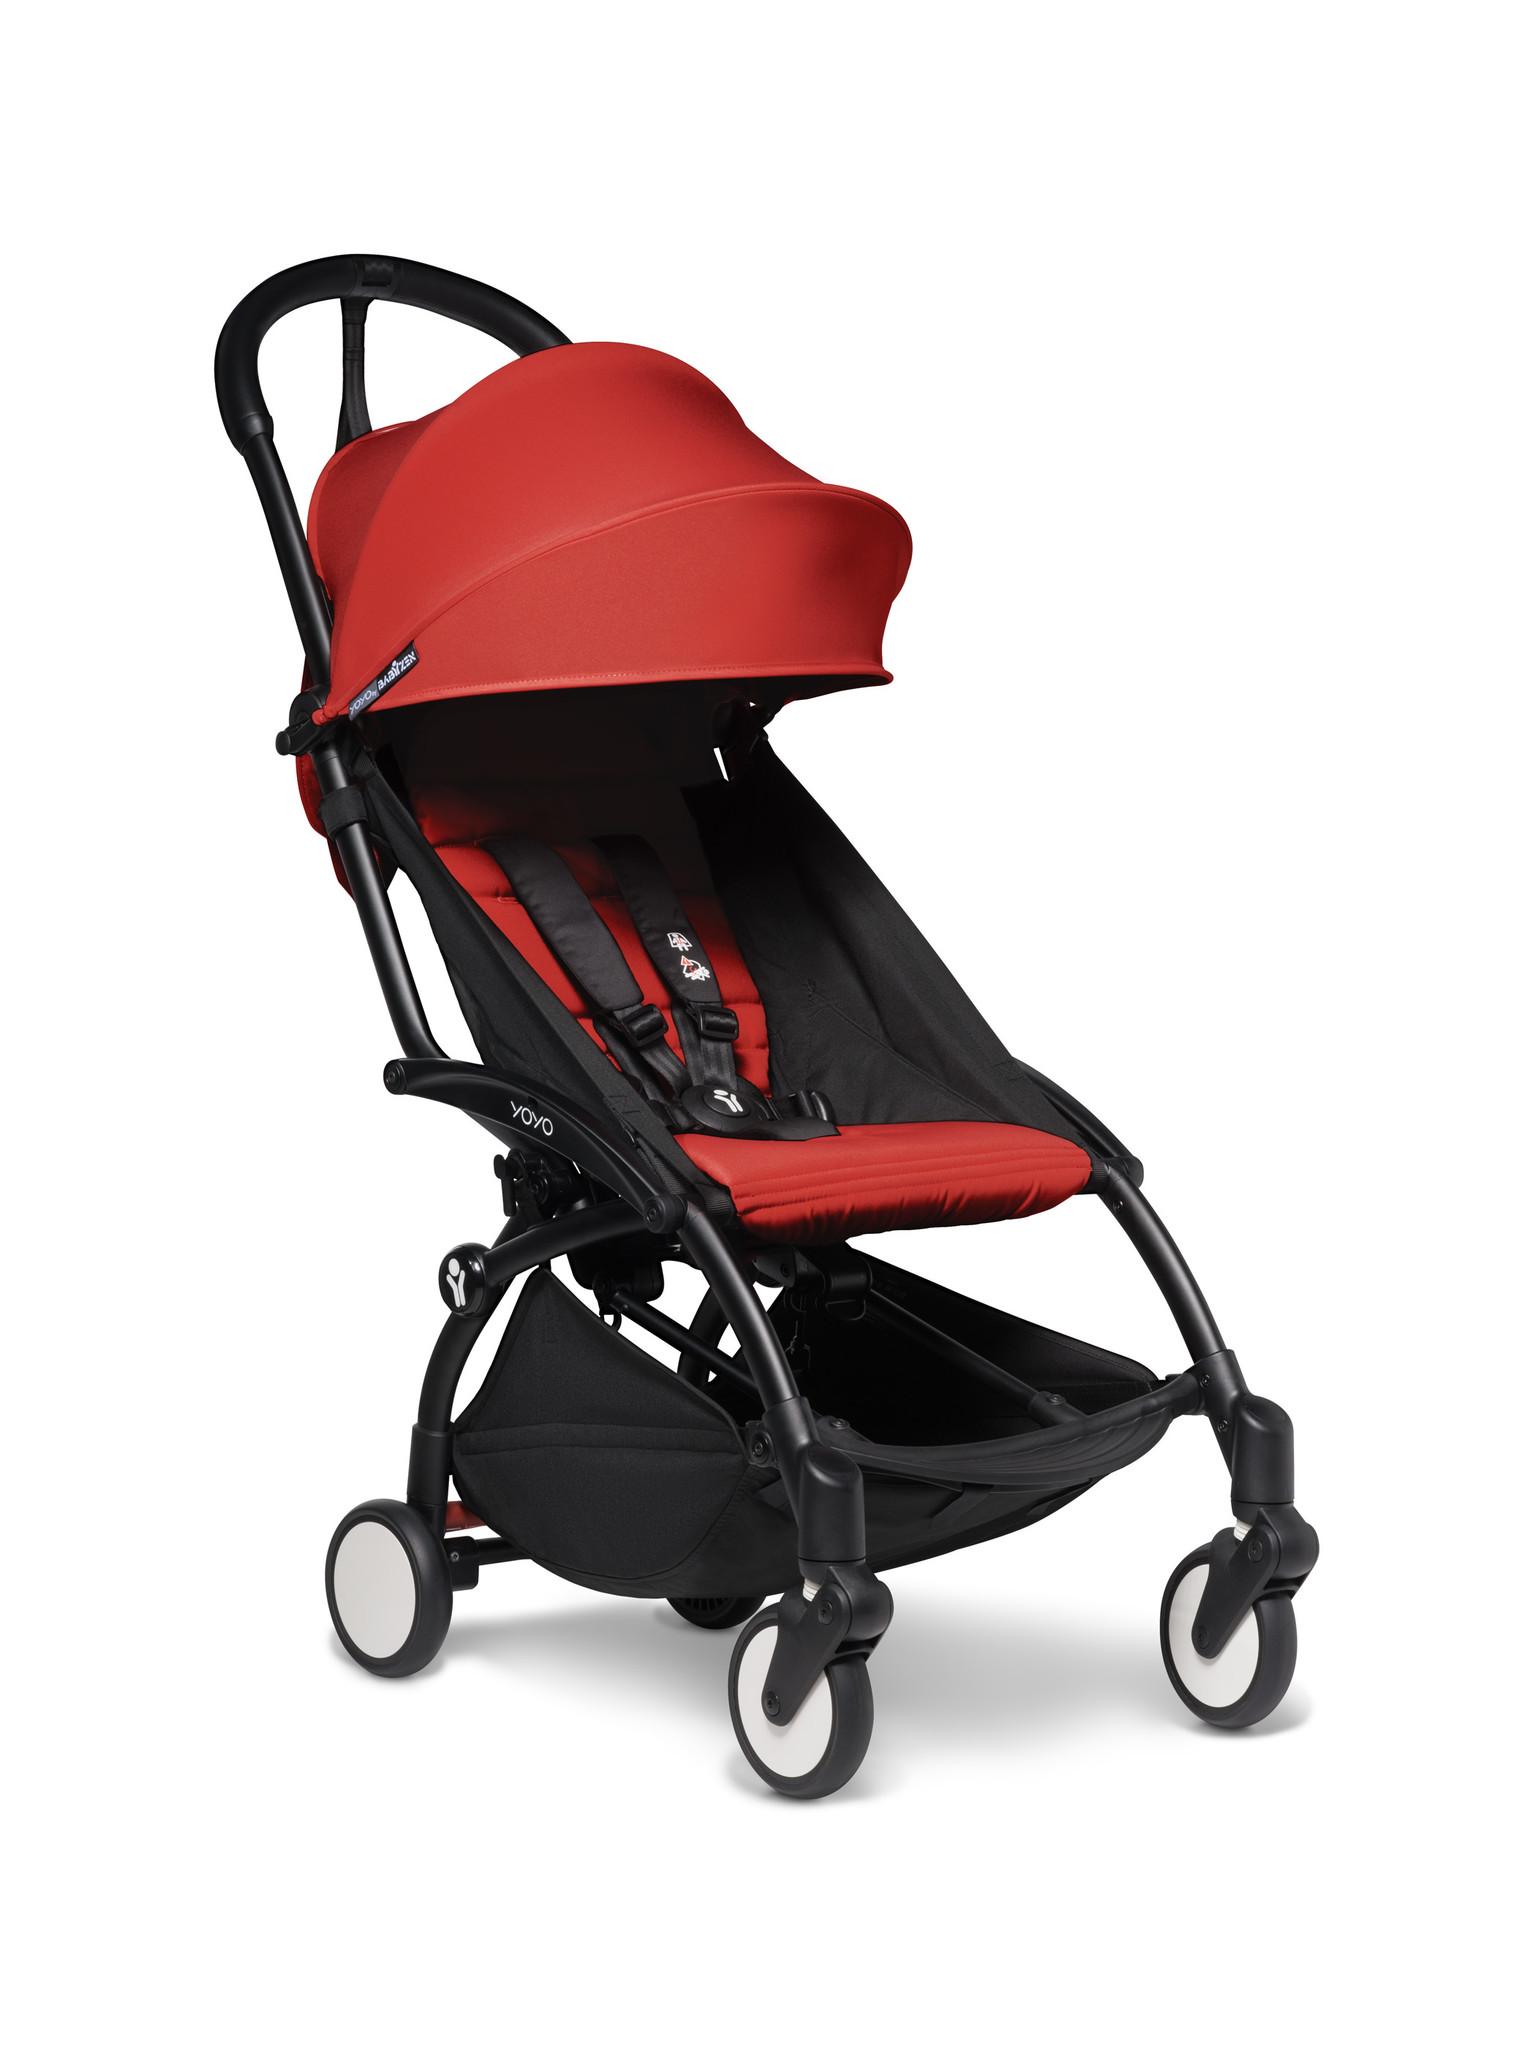 Babyzen Babyzen YOYO² Buggy KOMPLETT / VOLL SET 0+ und 6+ roter Rahmen schwarz inkl. YOYO² BeSafe Autositz schwarz